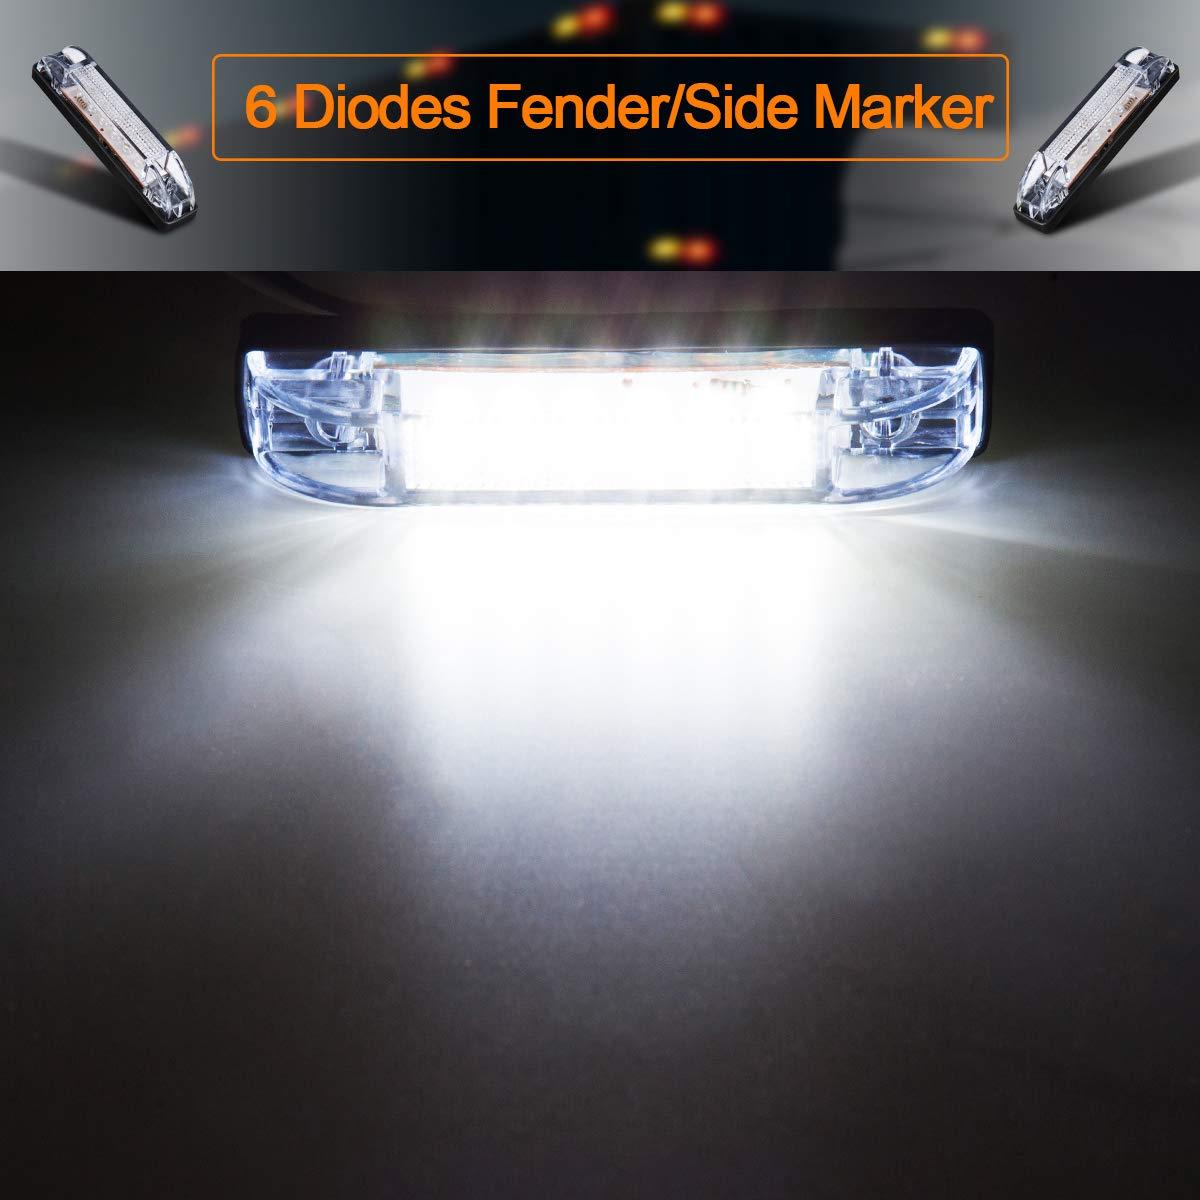 LIMICAR 4PCS White LED Slim Line Utility Strip Marker Light Bar 18 Diodes 12V Assembly Universal Utility Strip Light Boat Marker Light